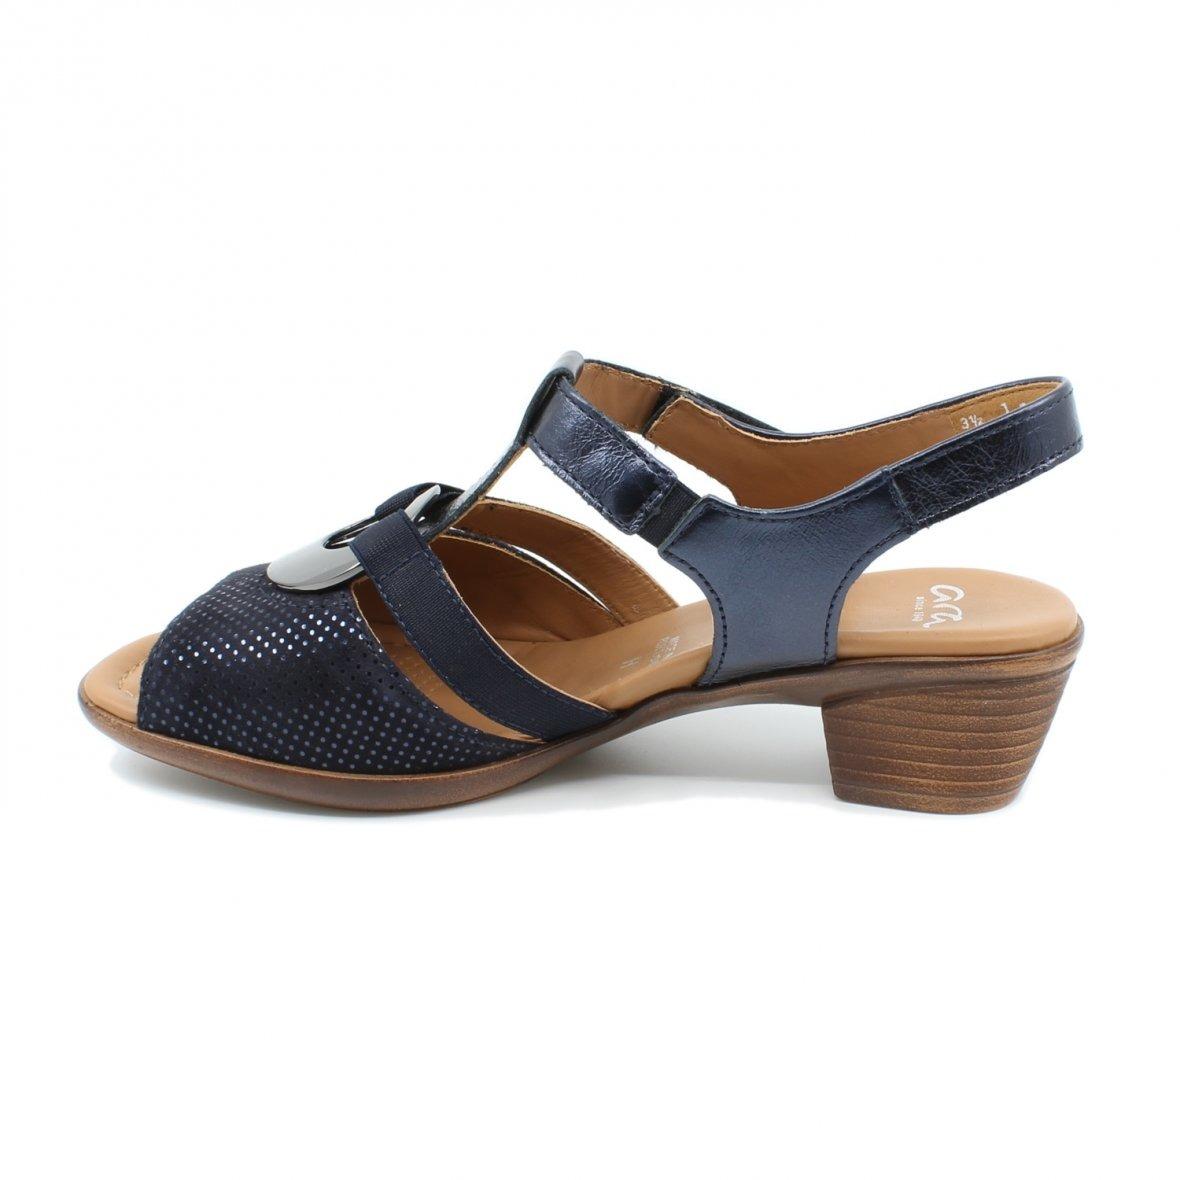 47a5d2177aee ARA - Sandále - Dámska otvorená sandála značky Ara